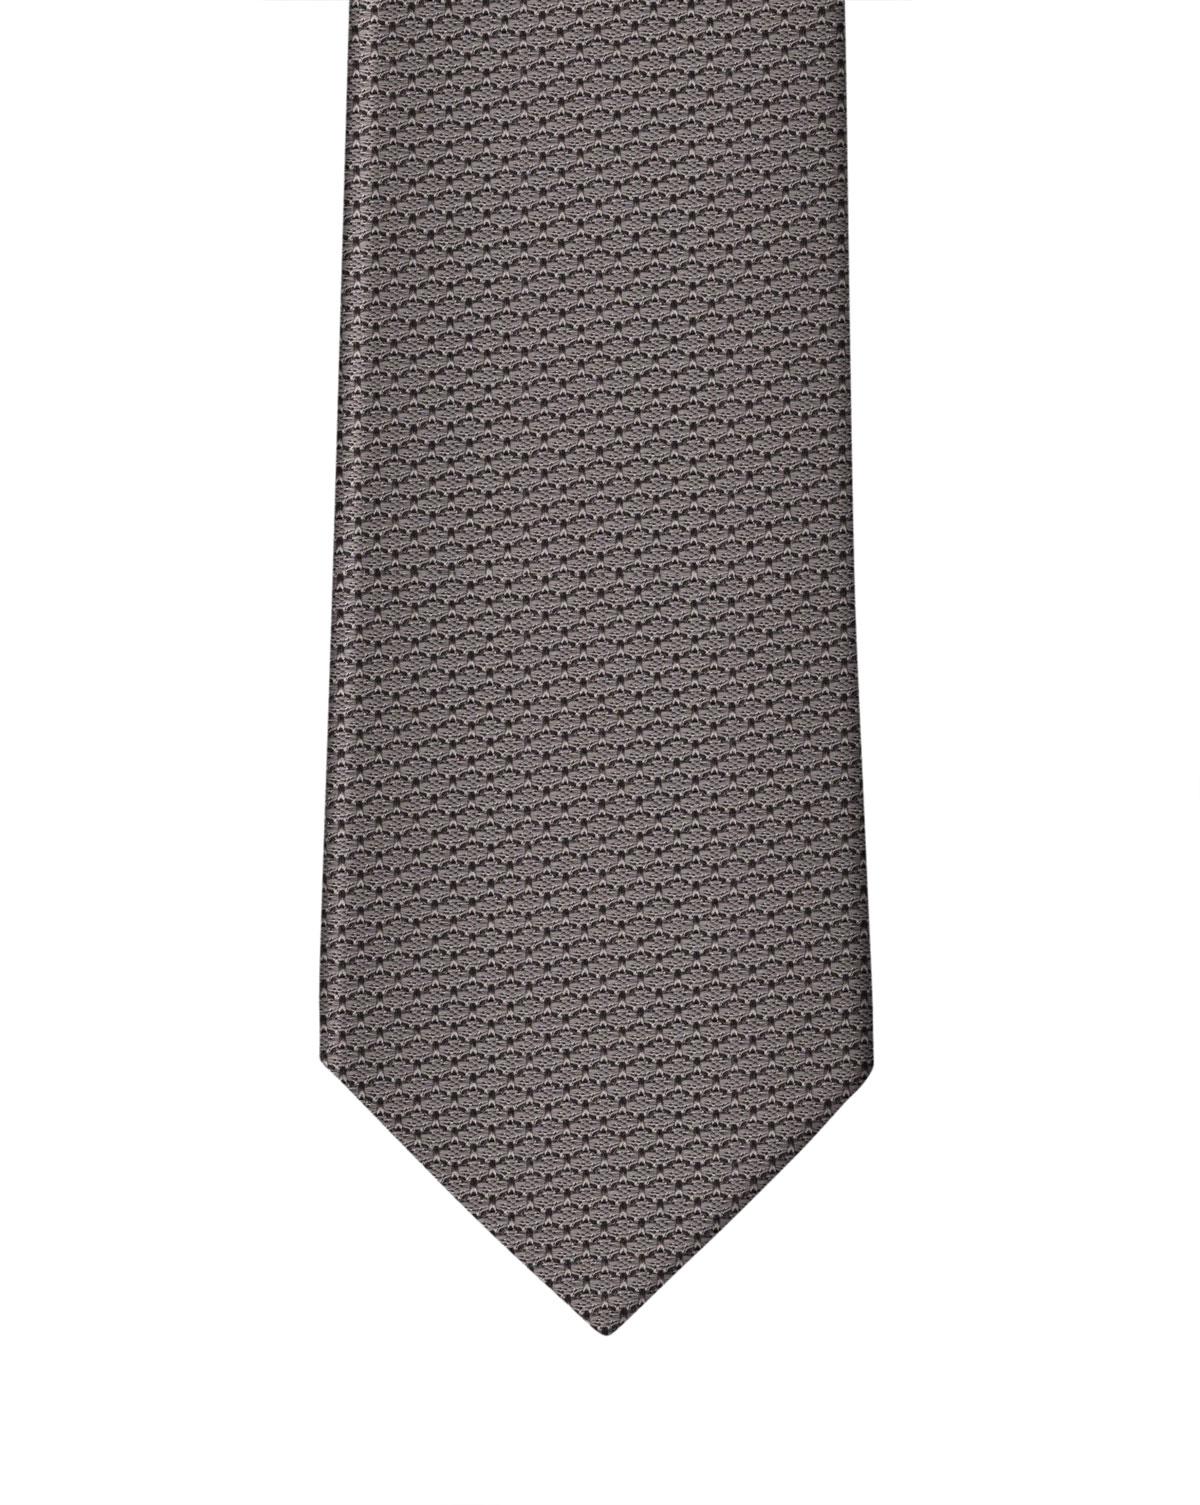 Medium Grey Grenadine Necktie